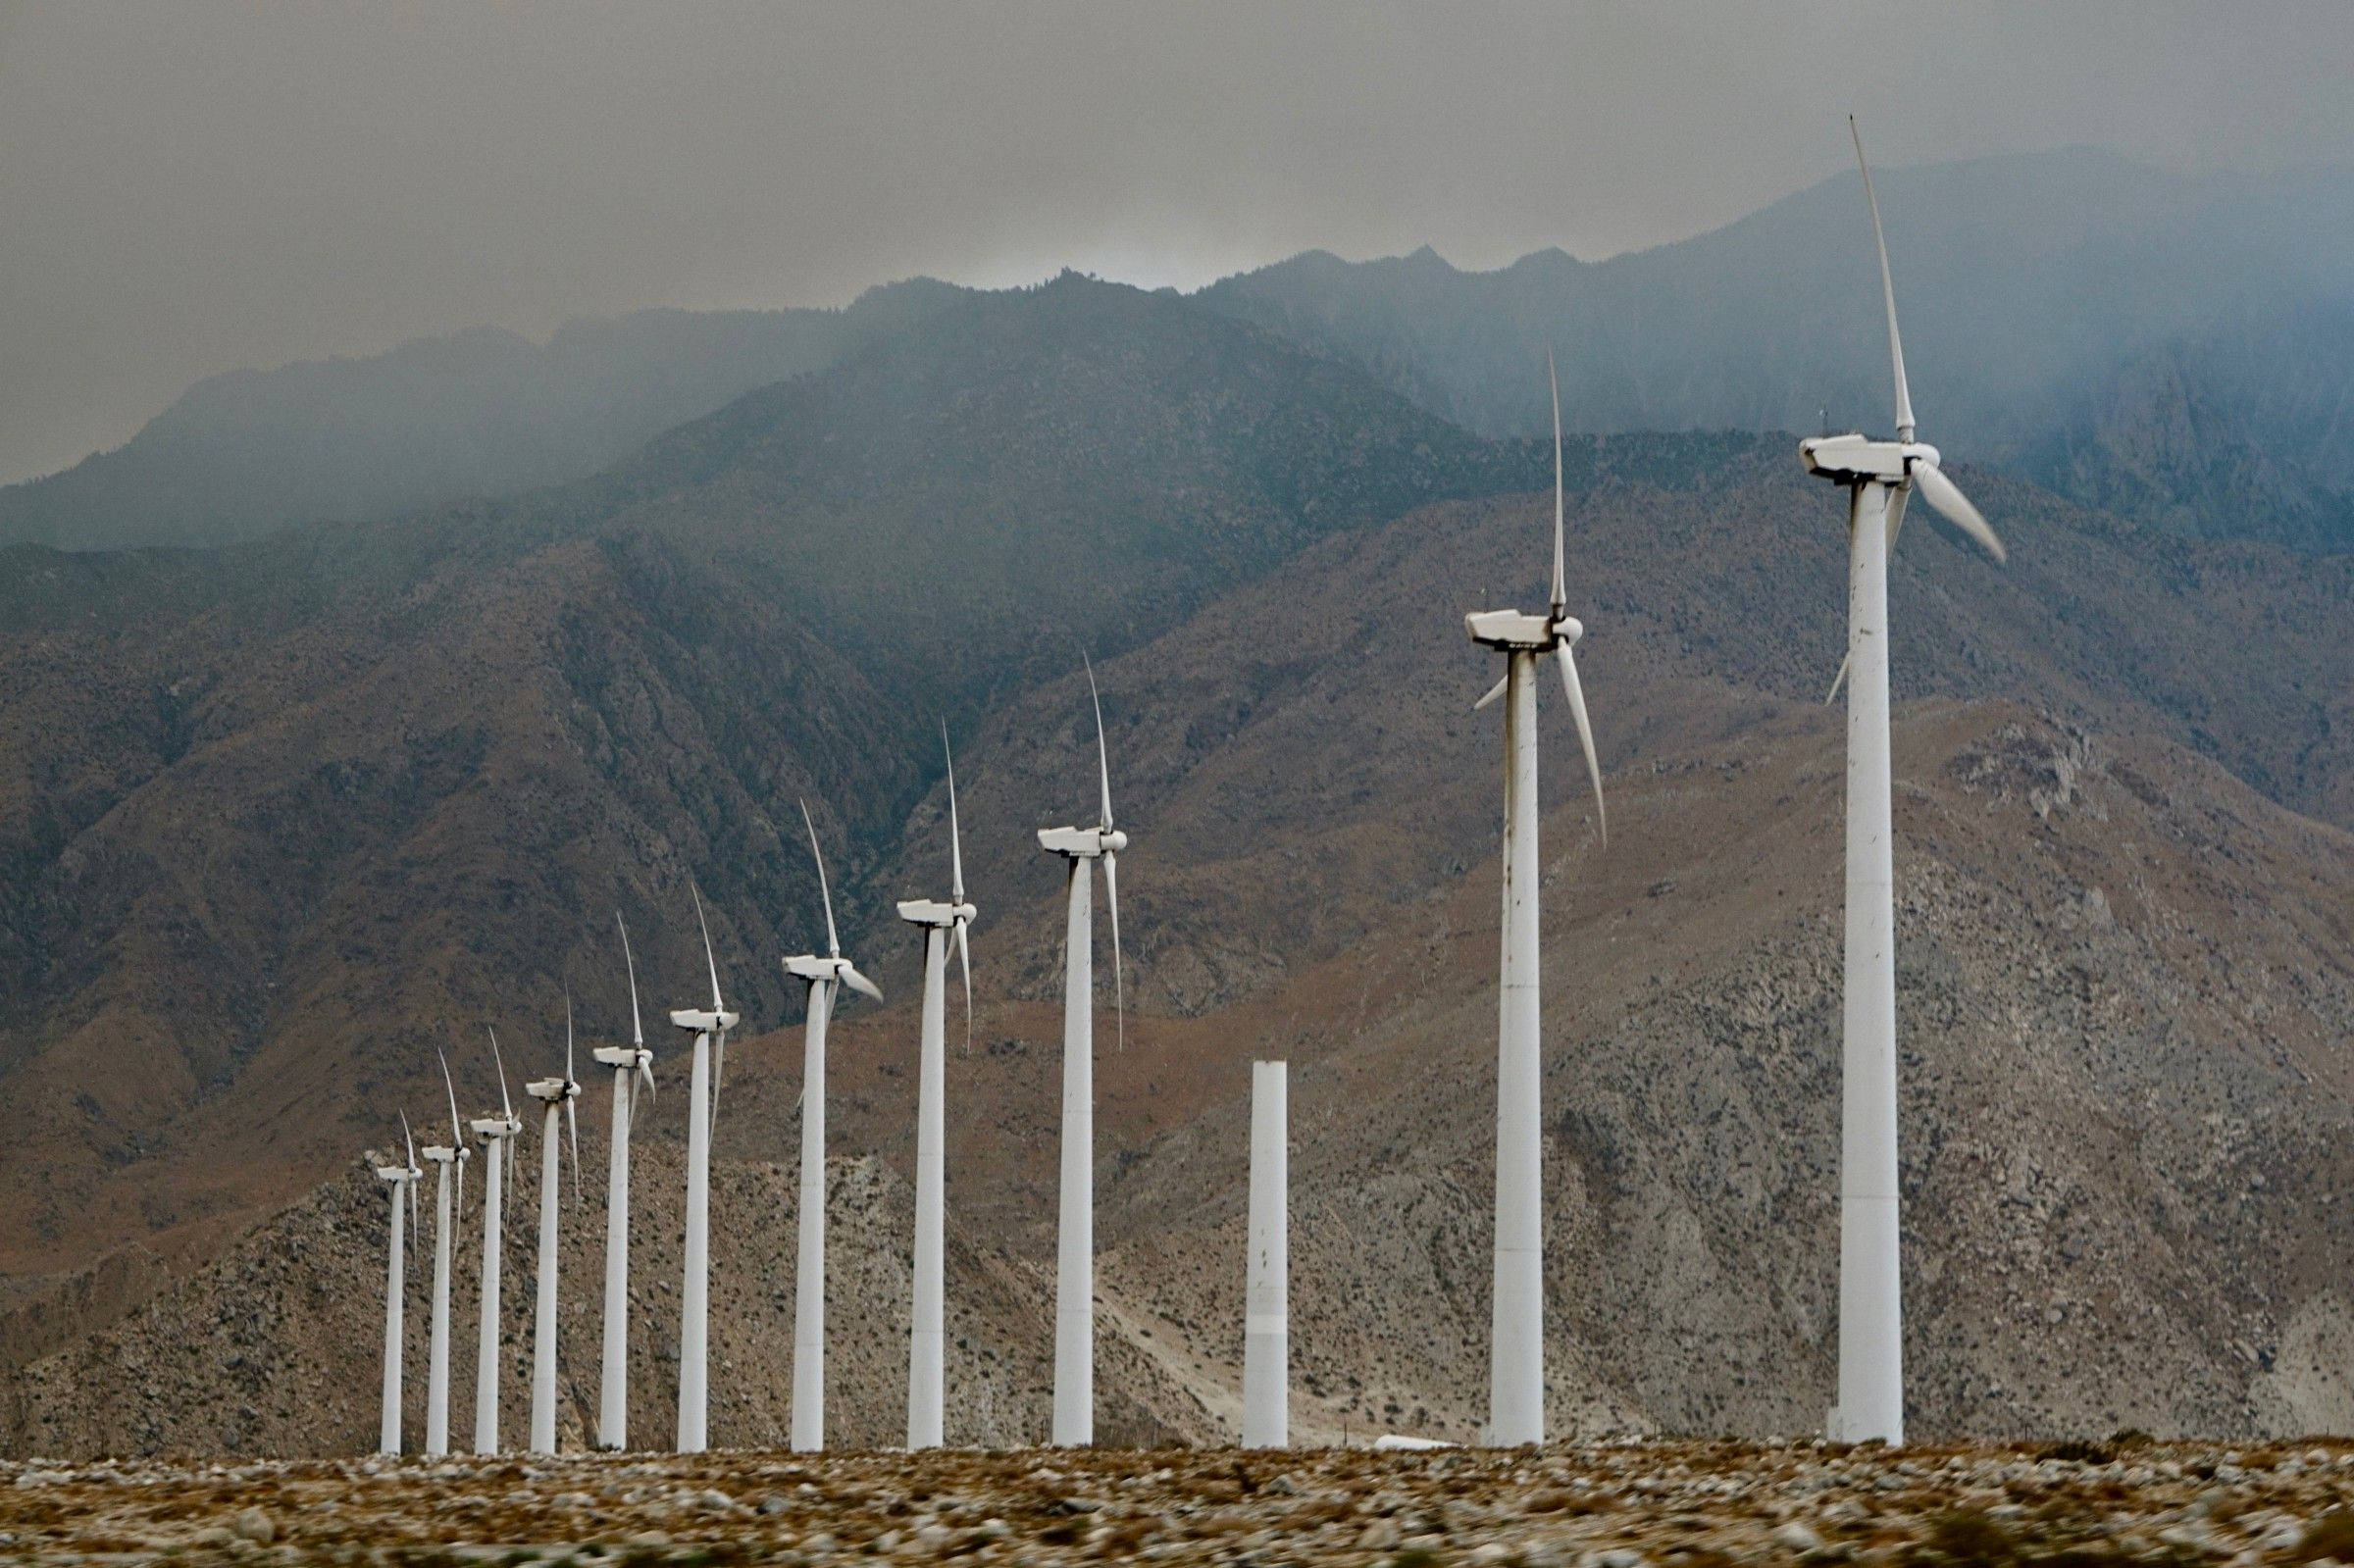 A photo of a wind farm in California.